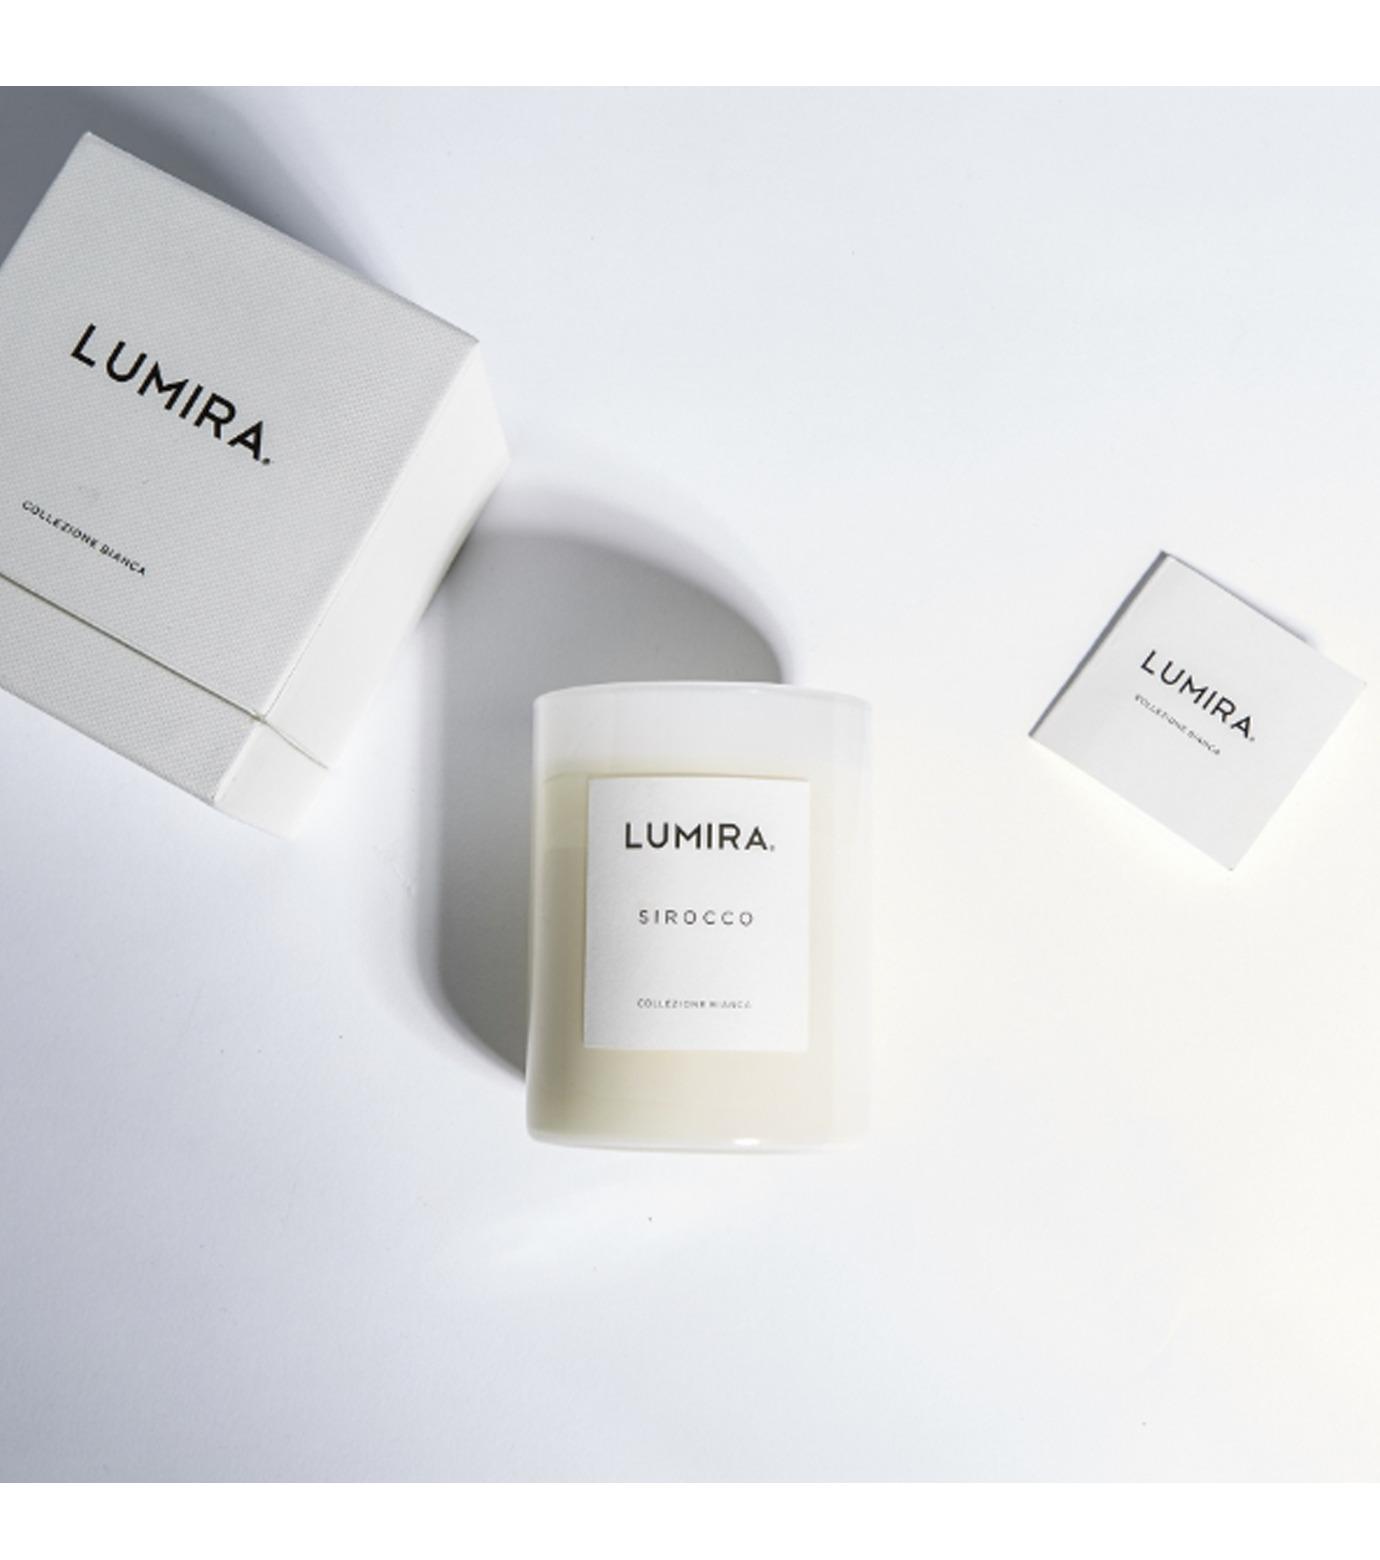 LUMIRA(ルミラ)のCollezione Bianca Sirocco-WHITE(キャンドル/candle)-103-CA-022-4 拡大詳細画像3